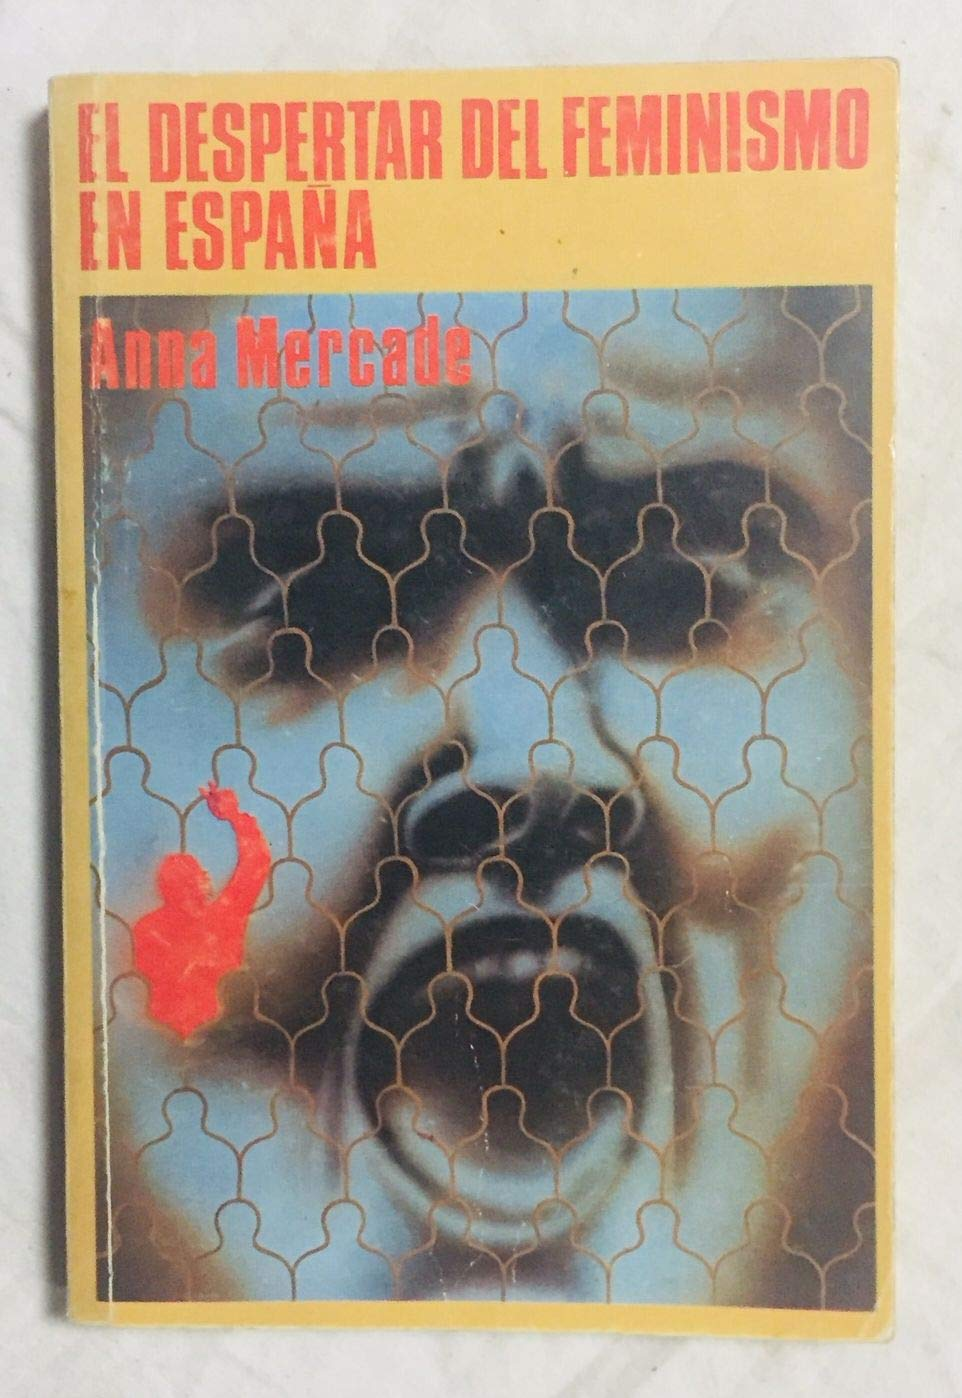 El despertar del feminismo en España: Amazon.es: Mercadé Ferrando, Anna: Libros en idiomas extranjeros